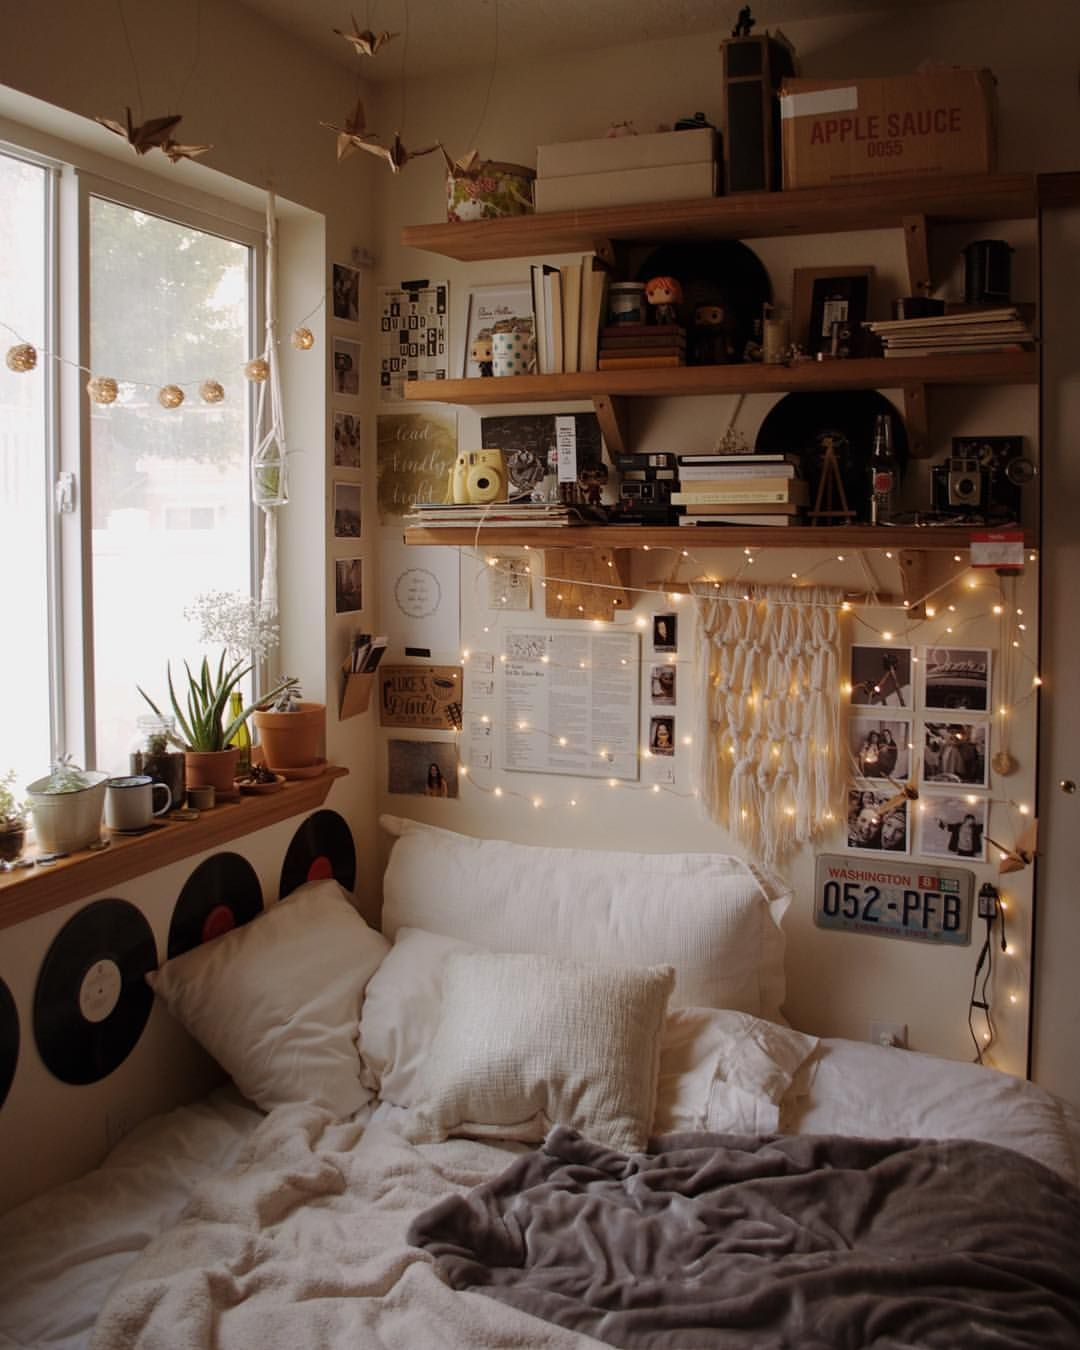 Aesthetic Dorm Room: Pin On Bedroom Ideas